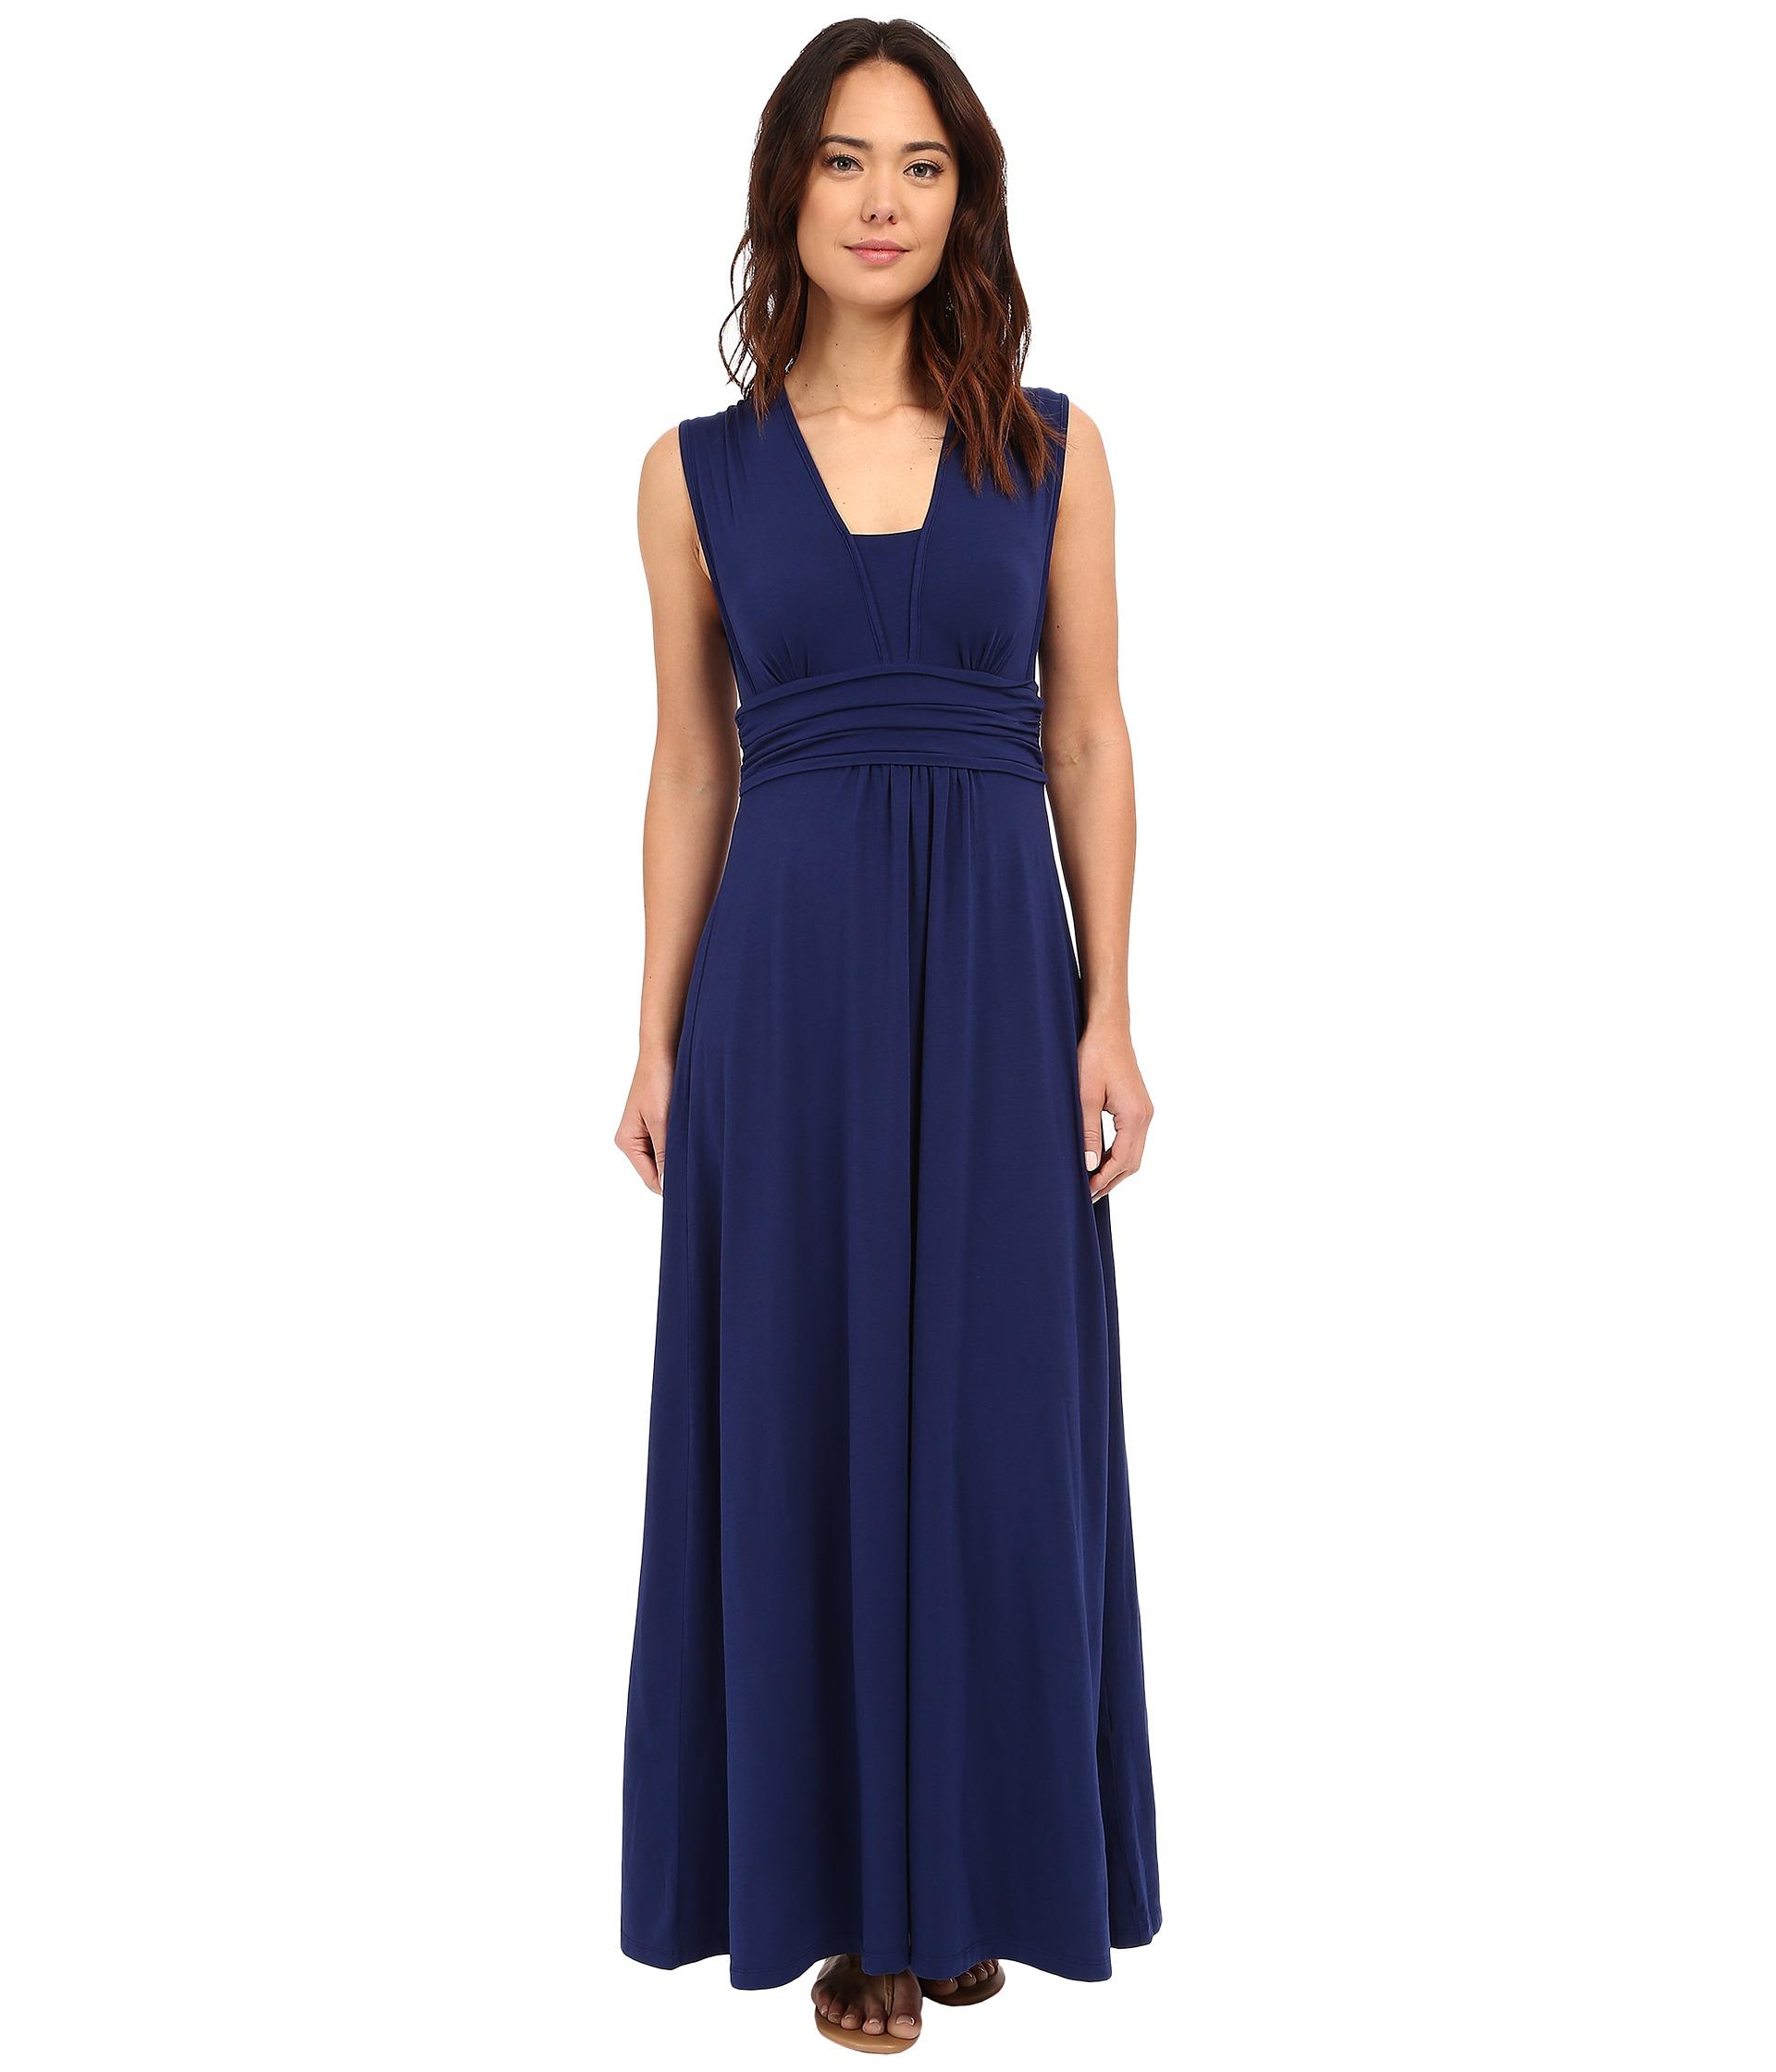 Cotton v-neck maxi dress